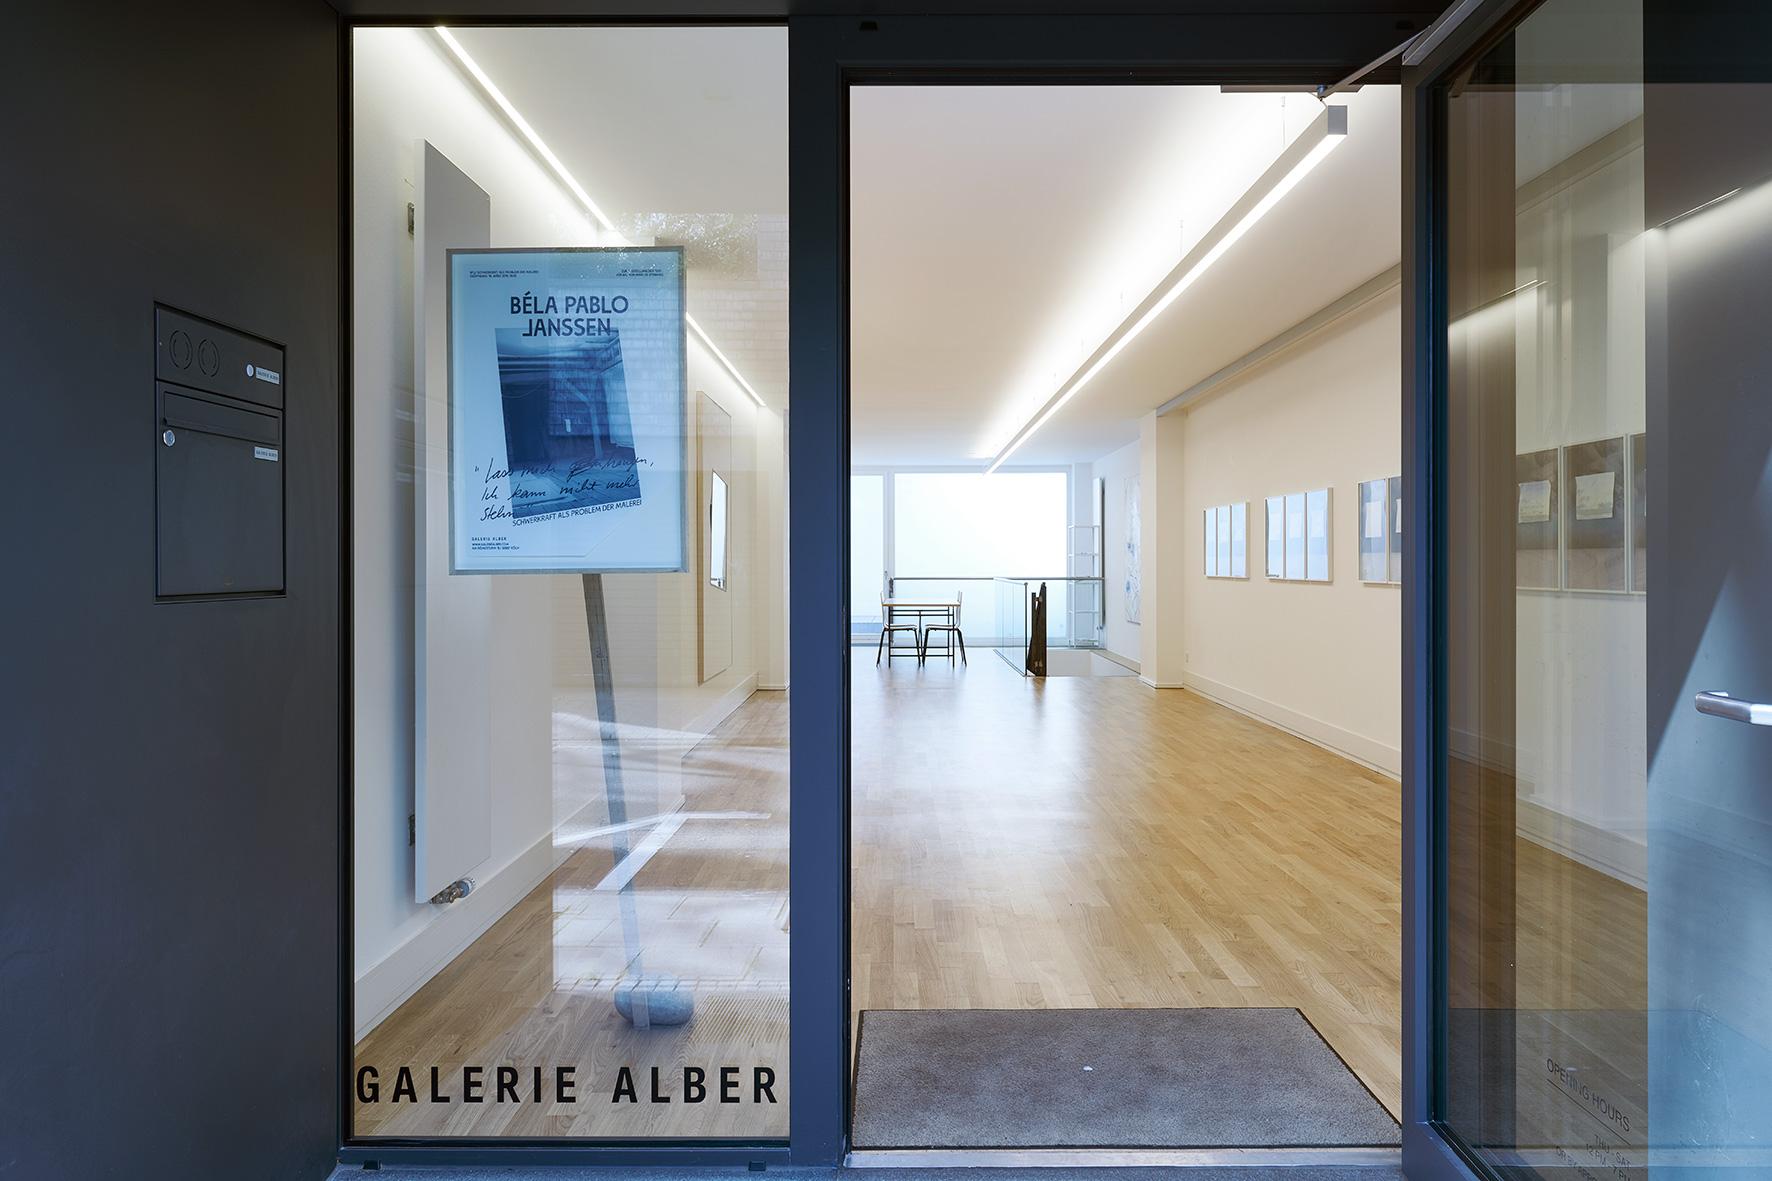 2019.03.19_Galerie-Alber_01.web.jpg